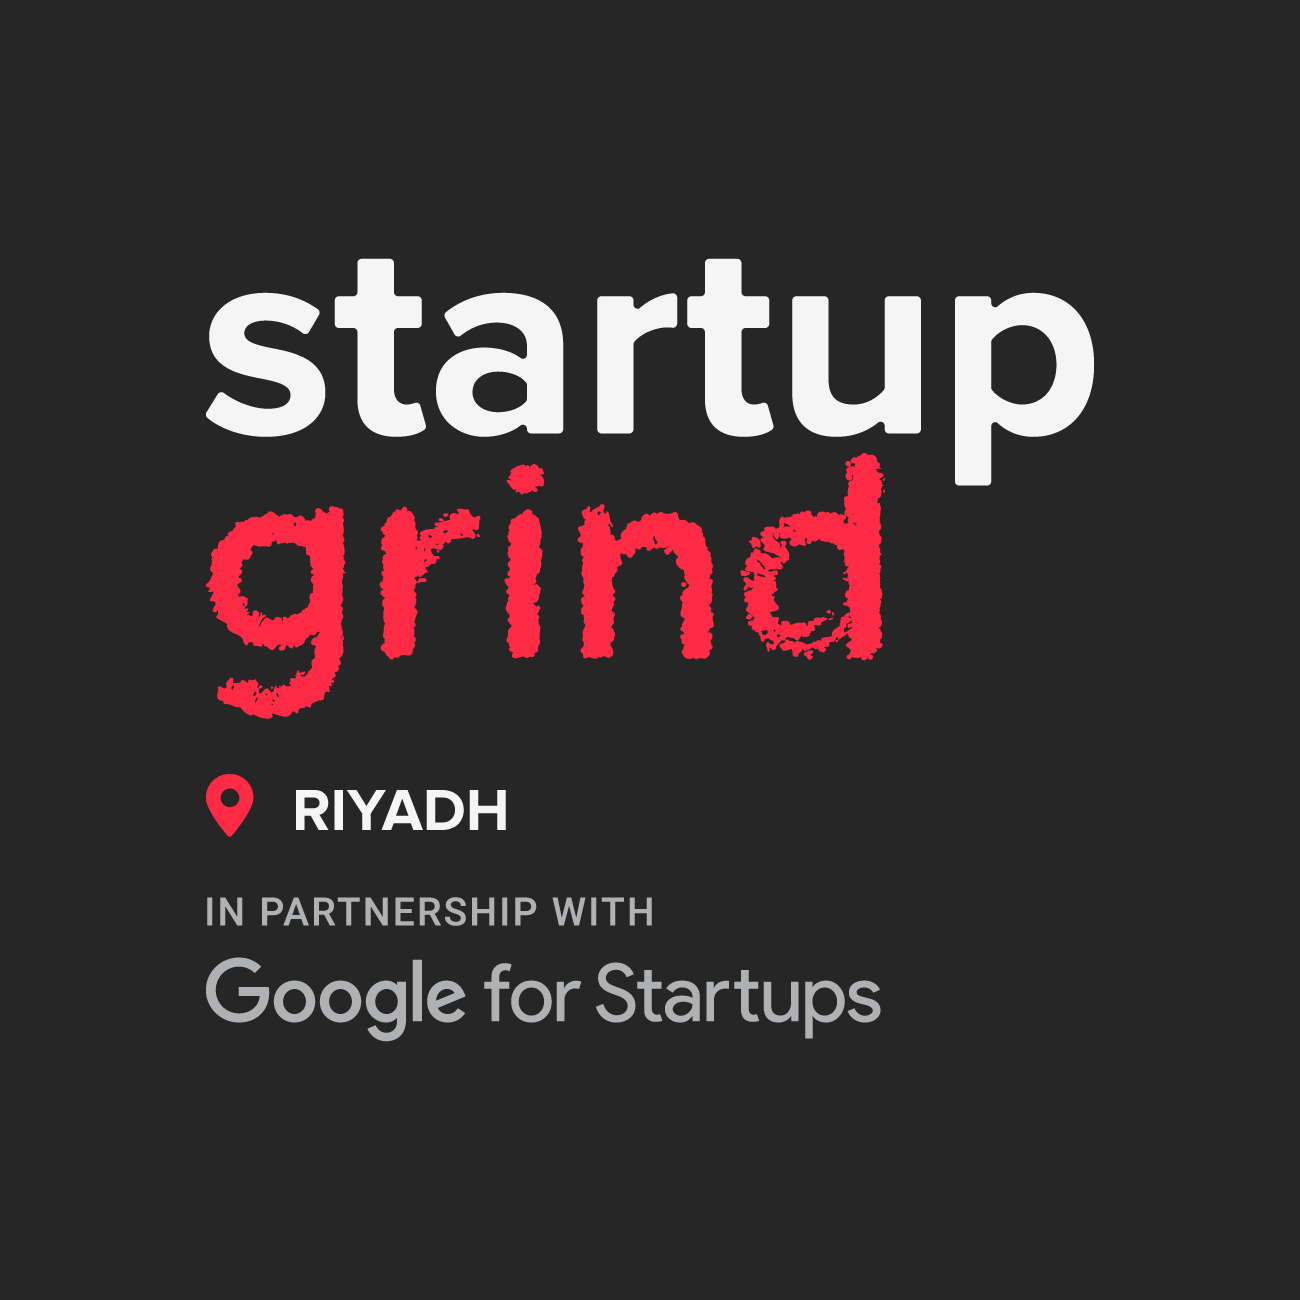 Startup Grind Riyadh